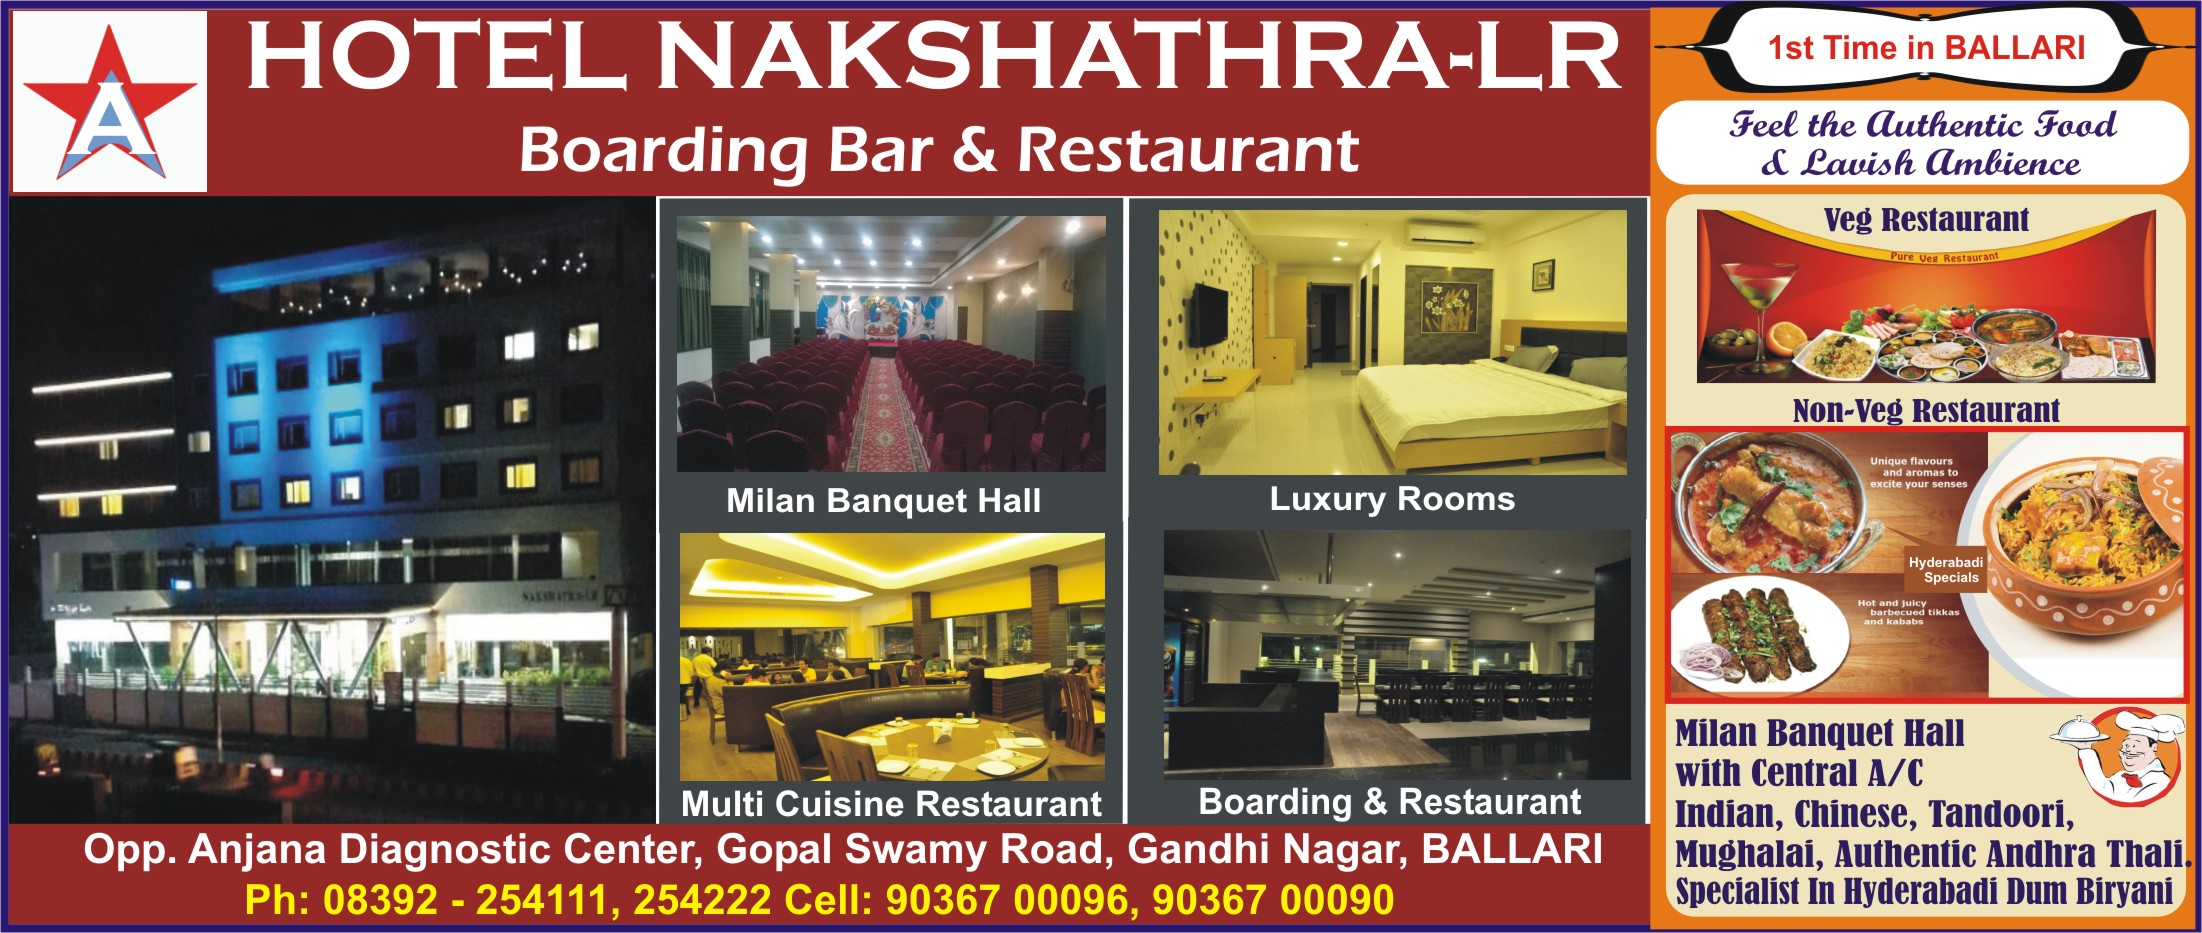 HOTEL NAKSHATHRA-LR